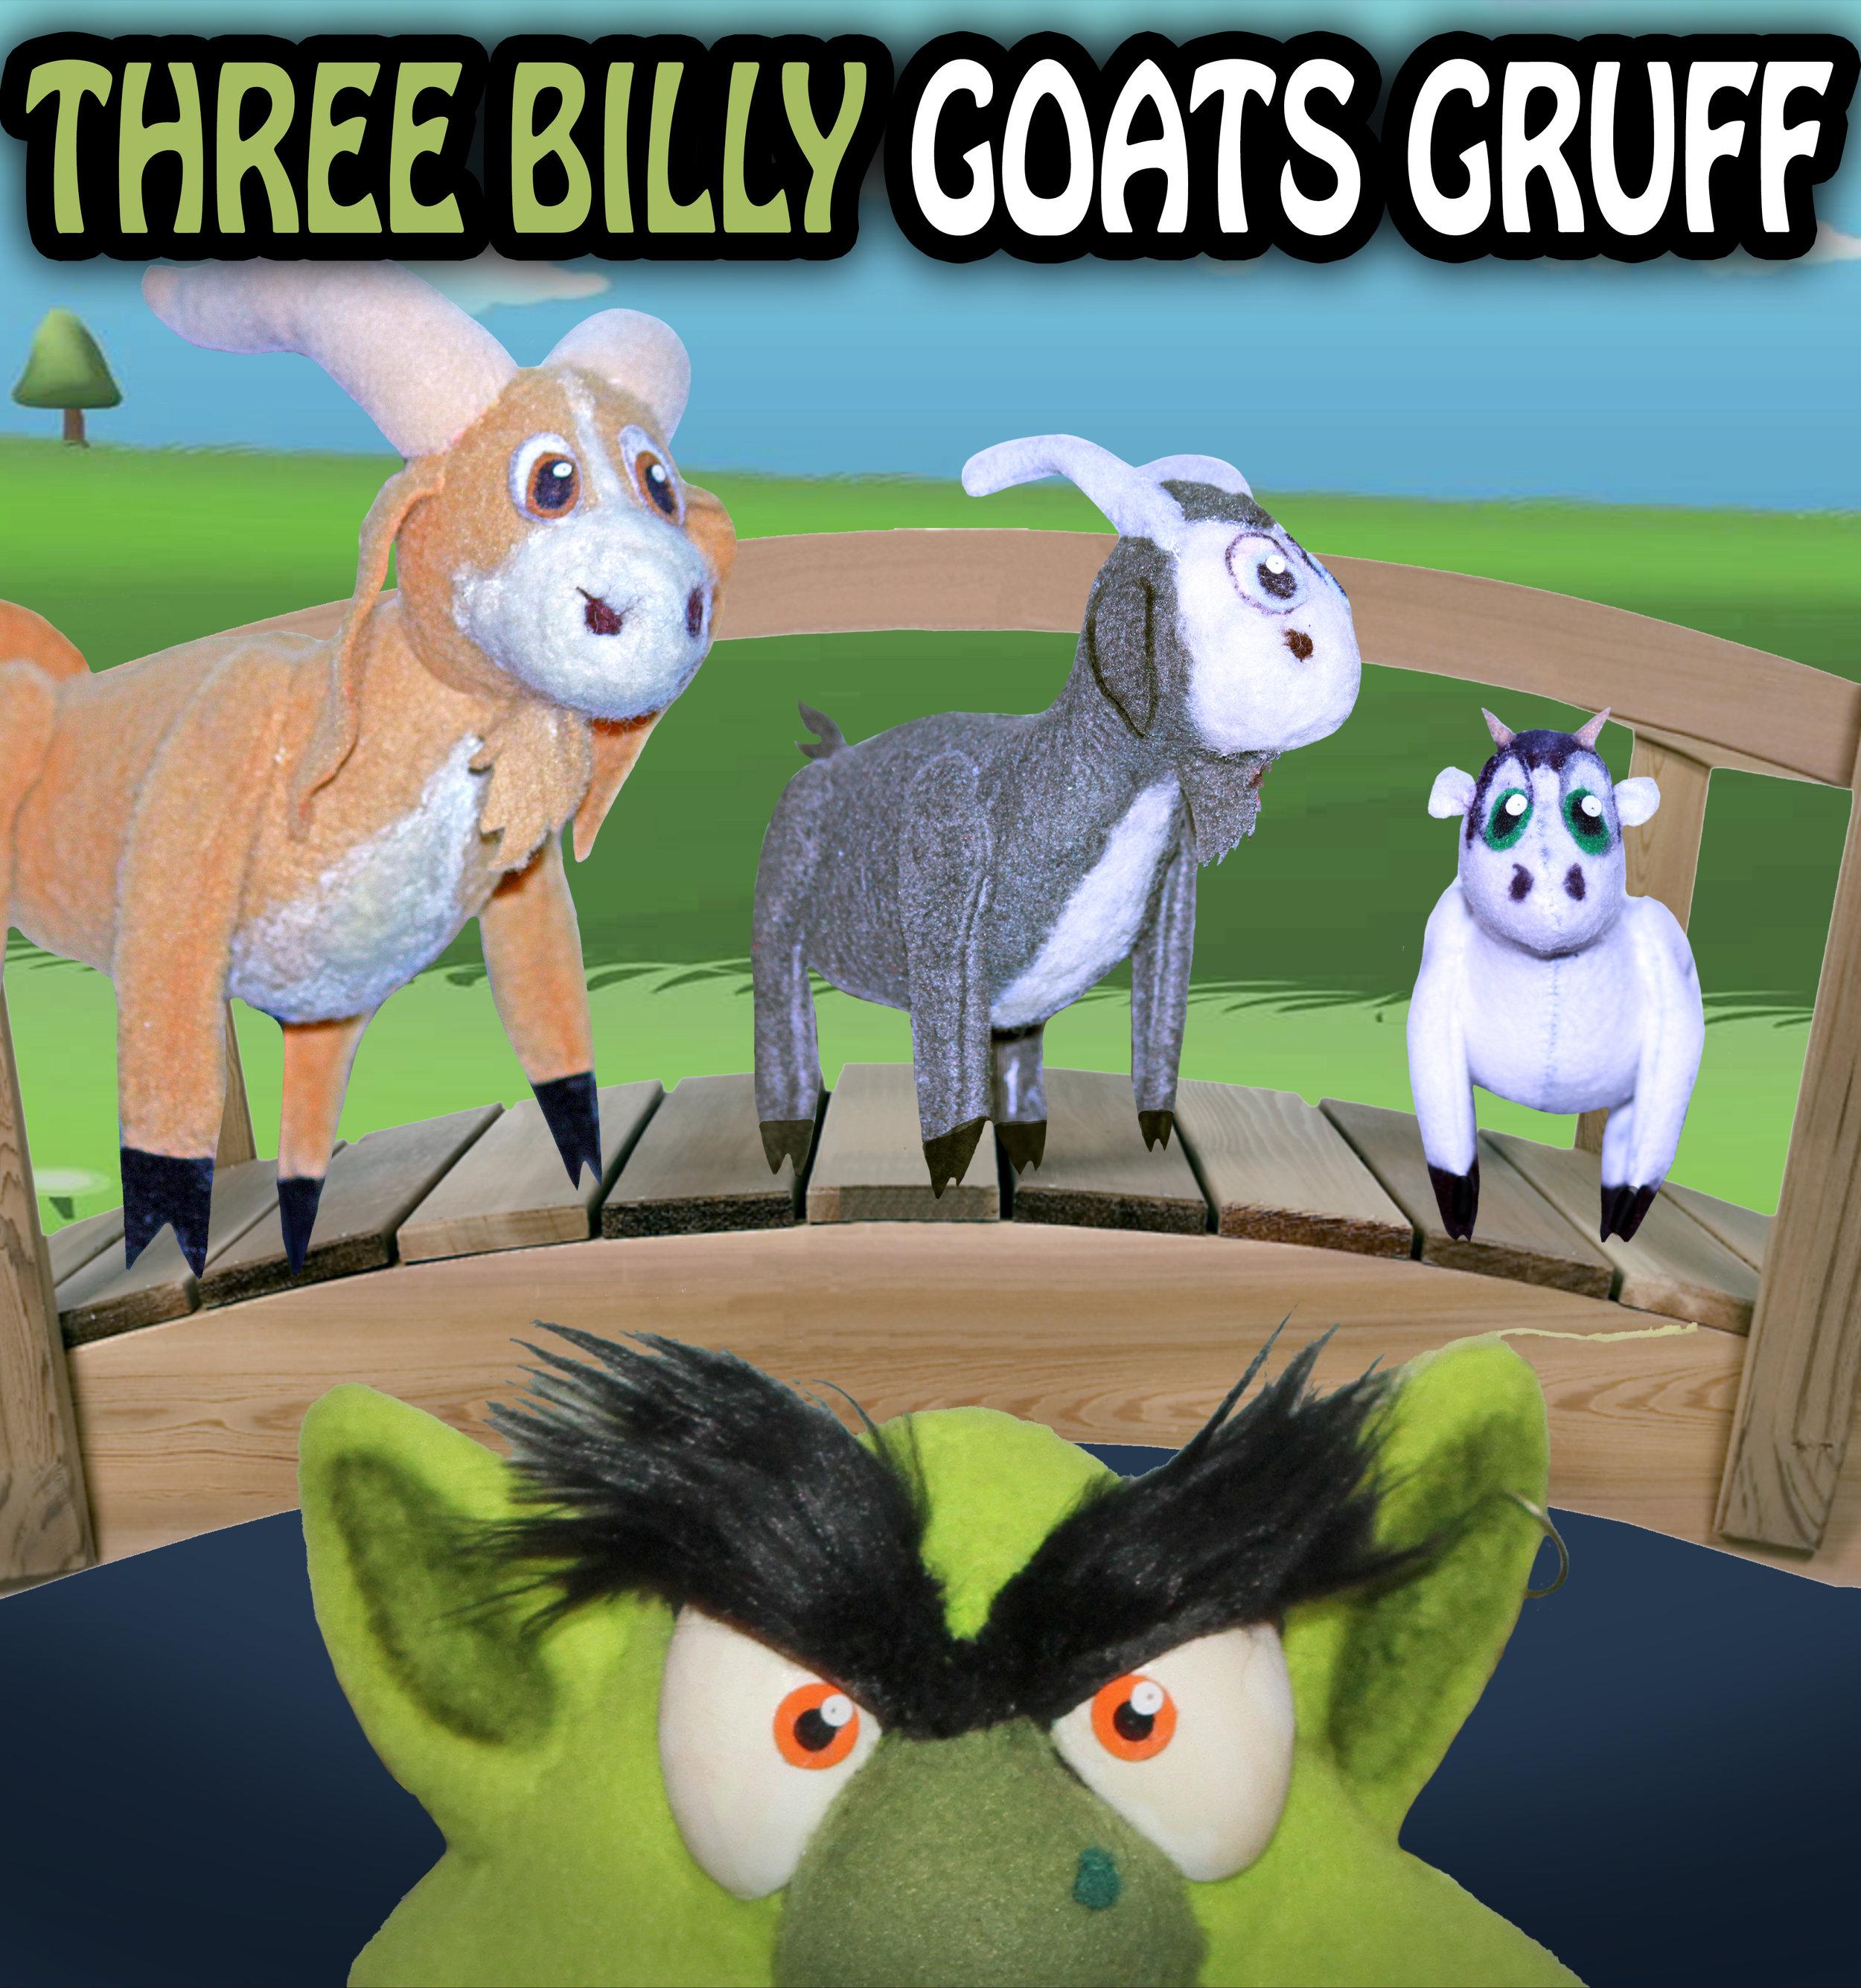 CPC_BillyGoatsGruff_Poster_Main.jpg